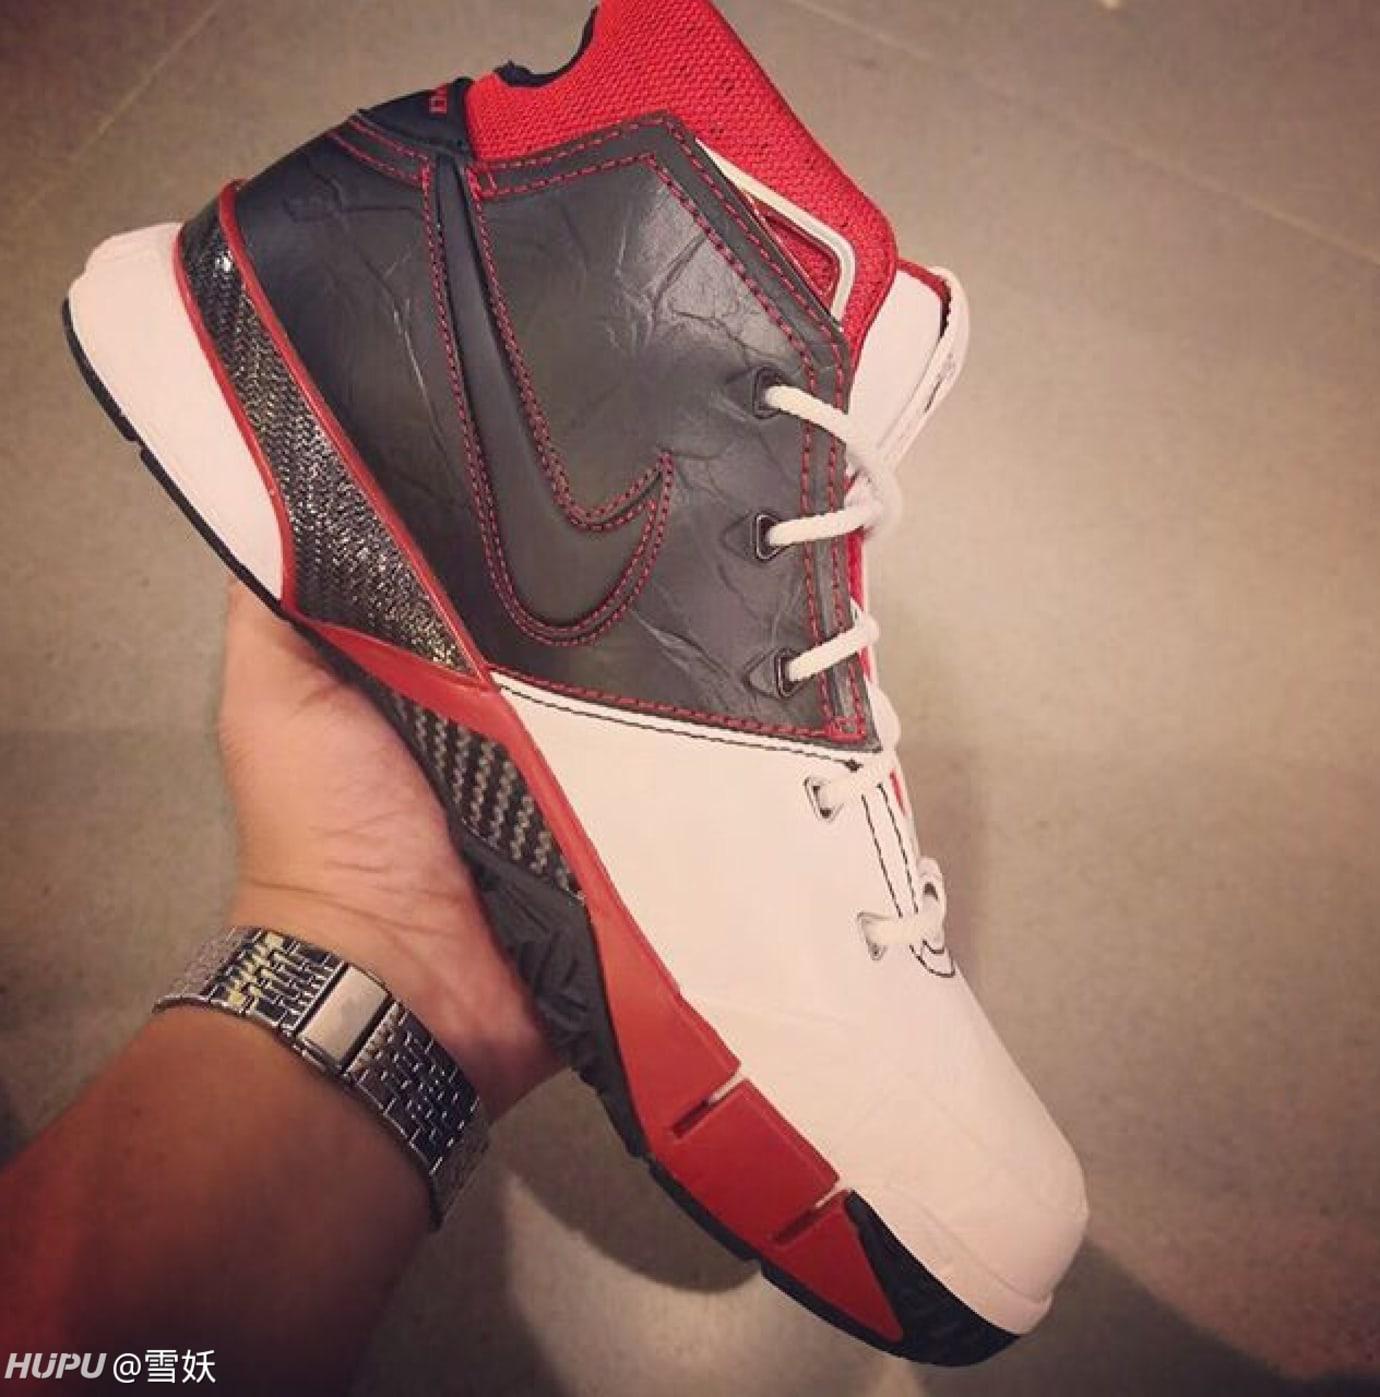 51f47c094194 Image via Hupu · Nike Zoom Kobe 1 Protro All-Star Release Date AQ2728-102  Medial